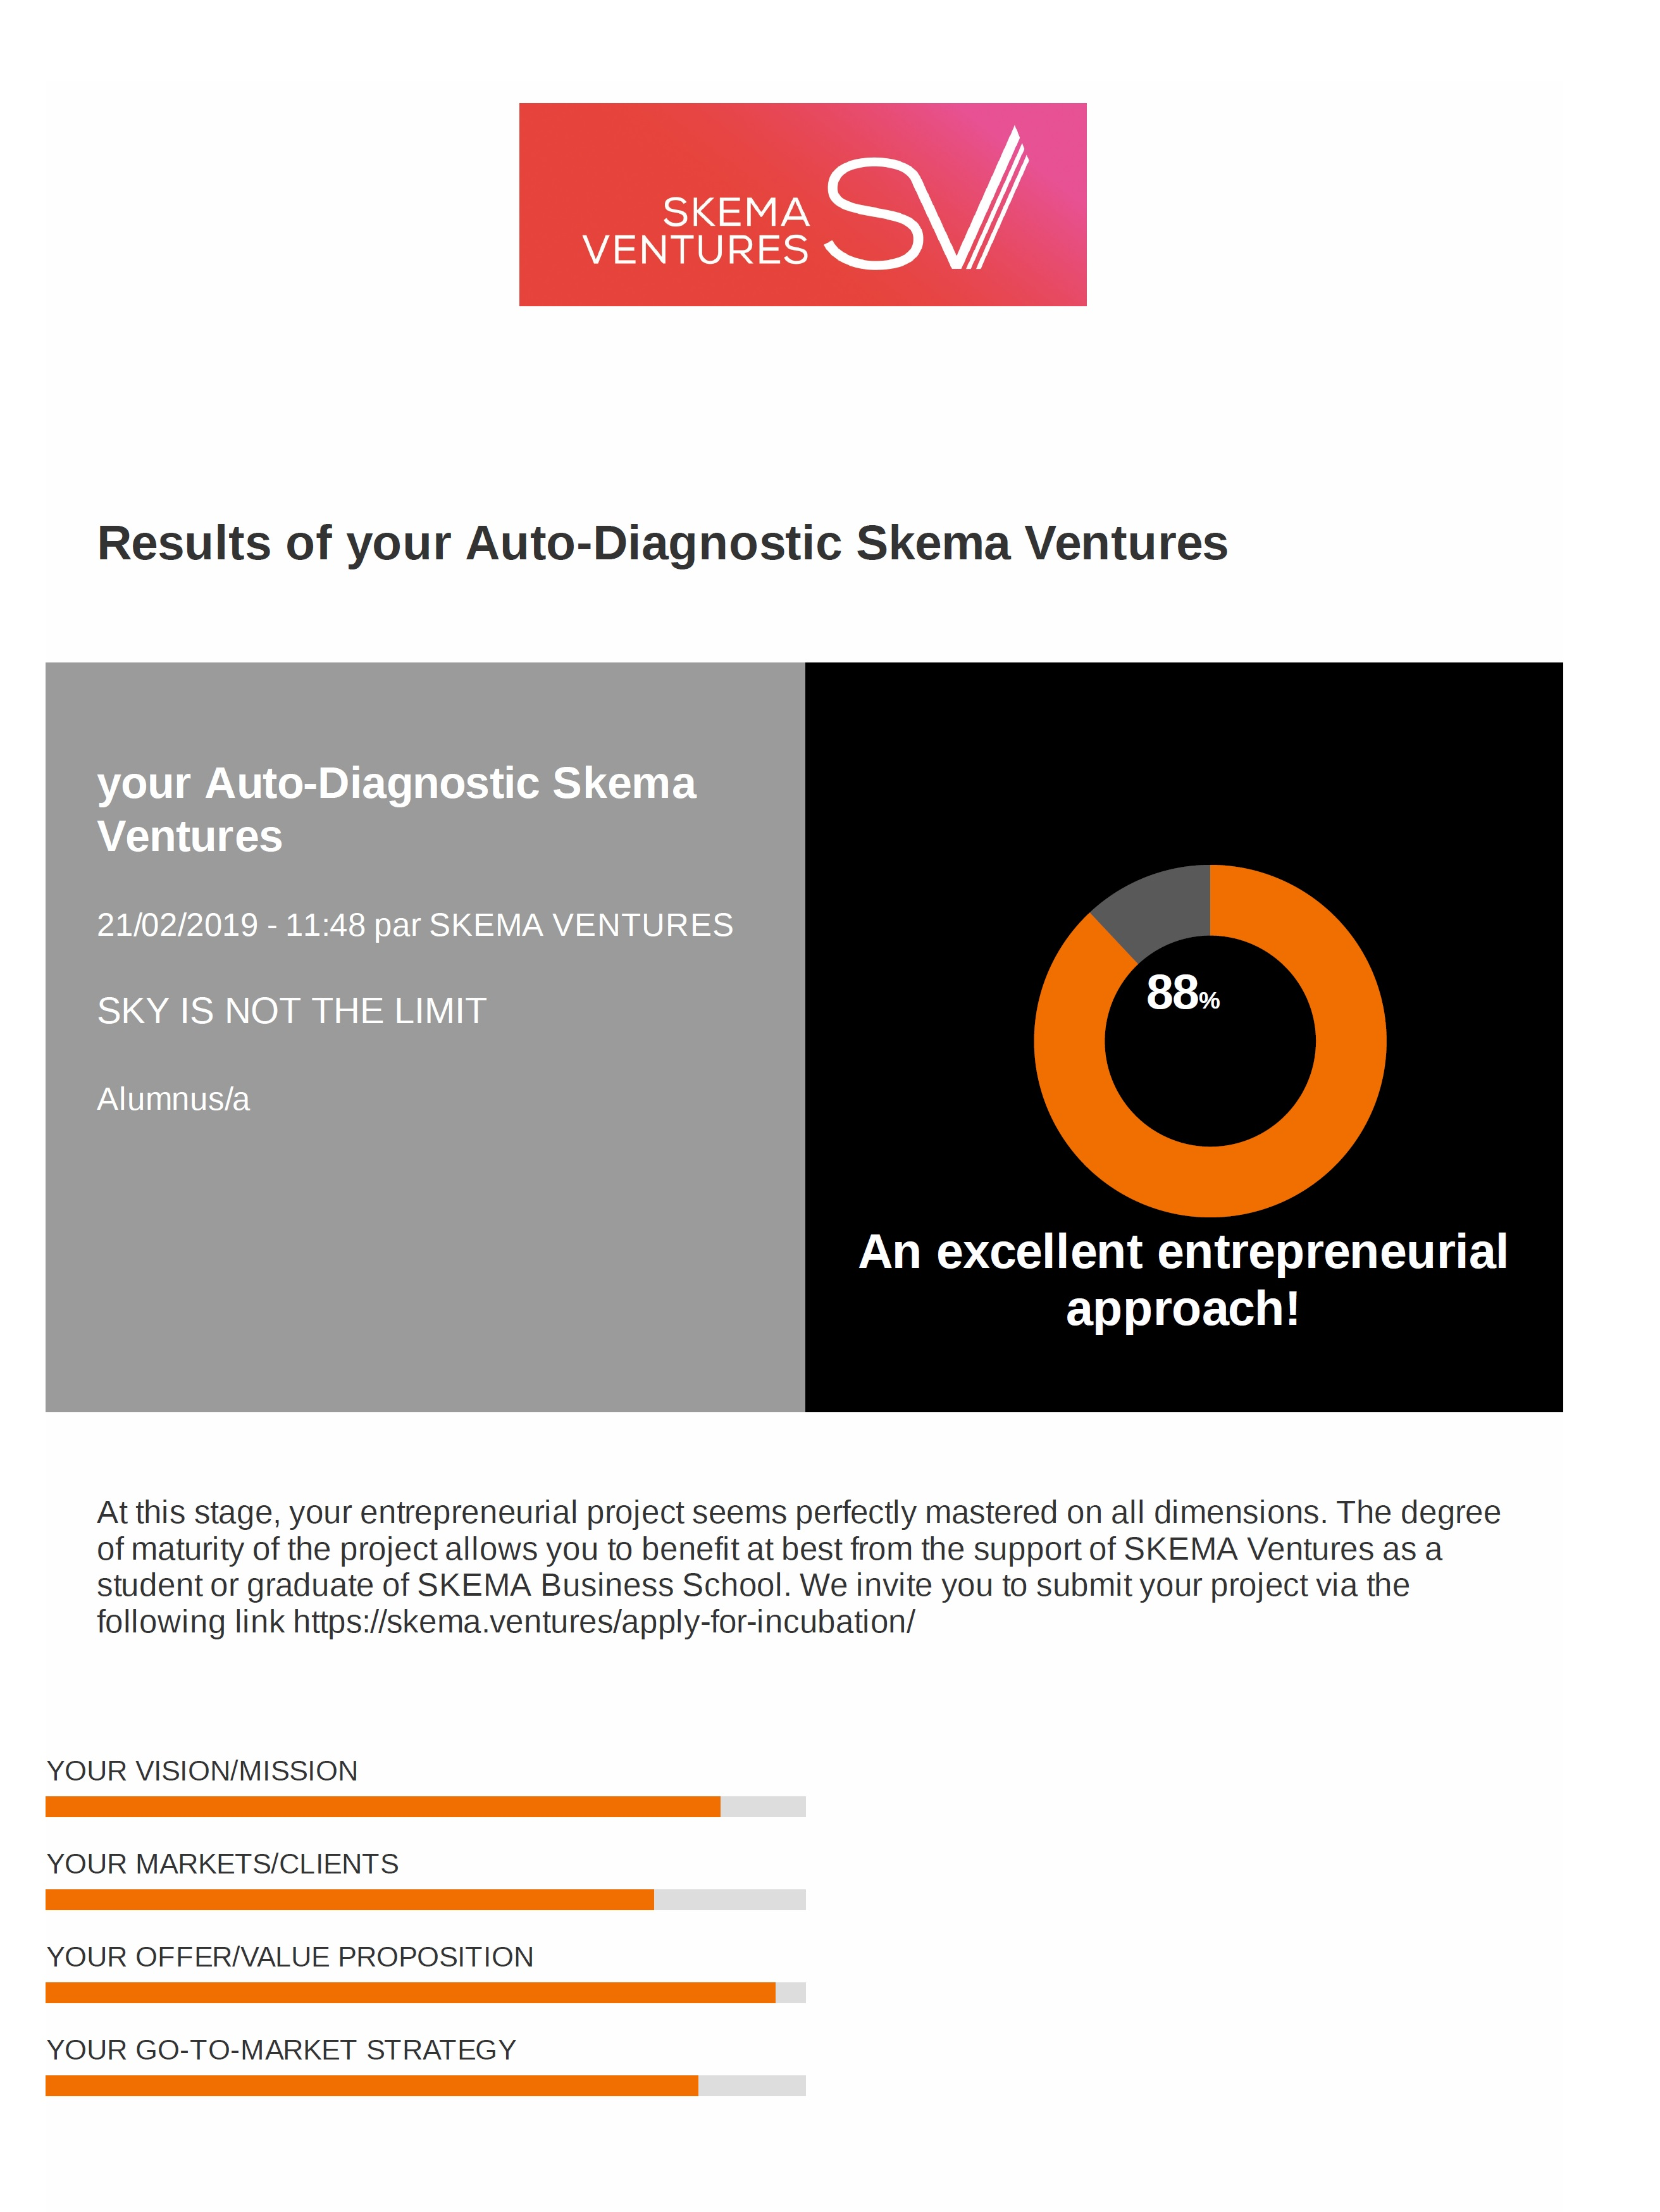 SKEMA Ventures Auto-diagnostic Tool